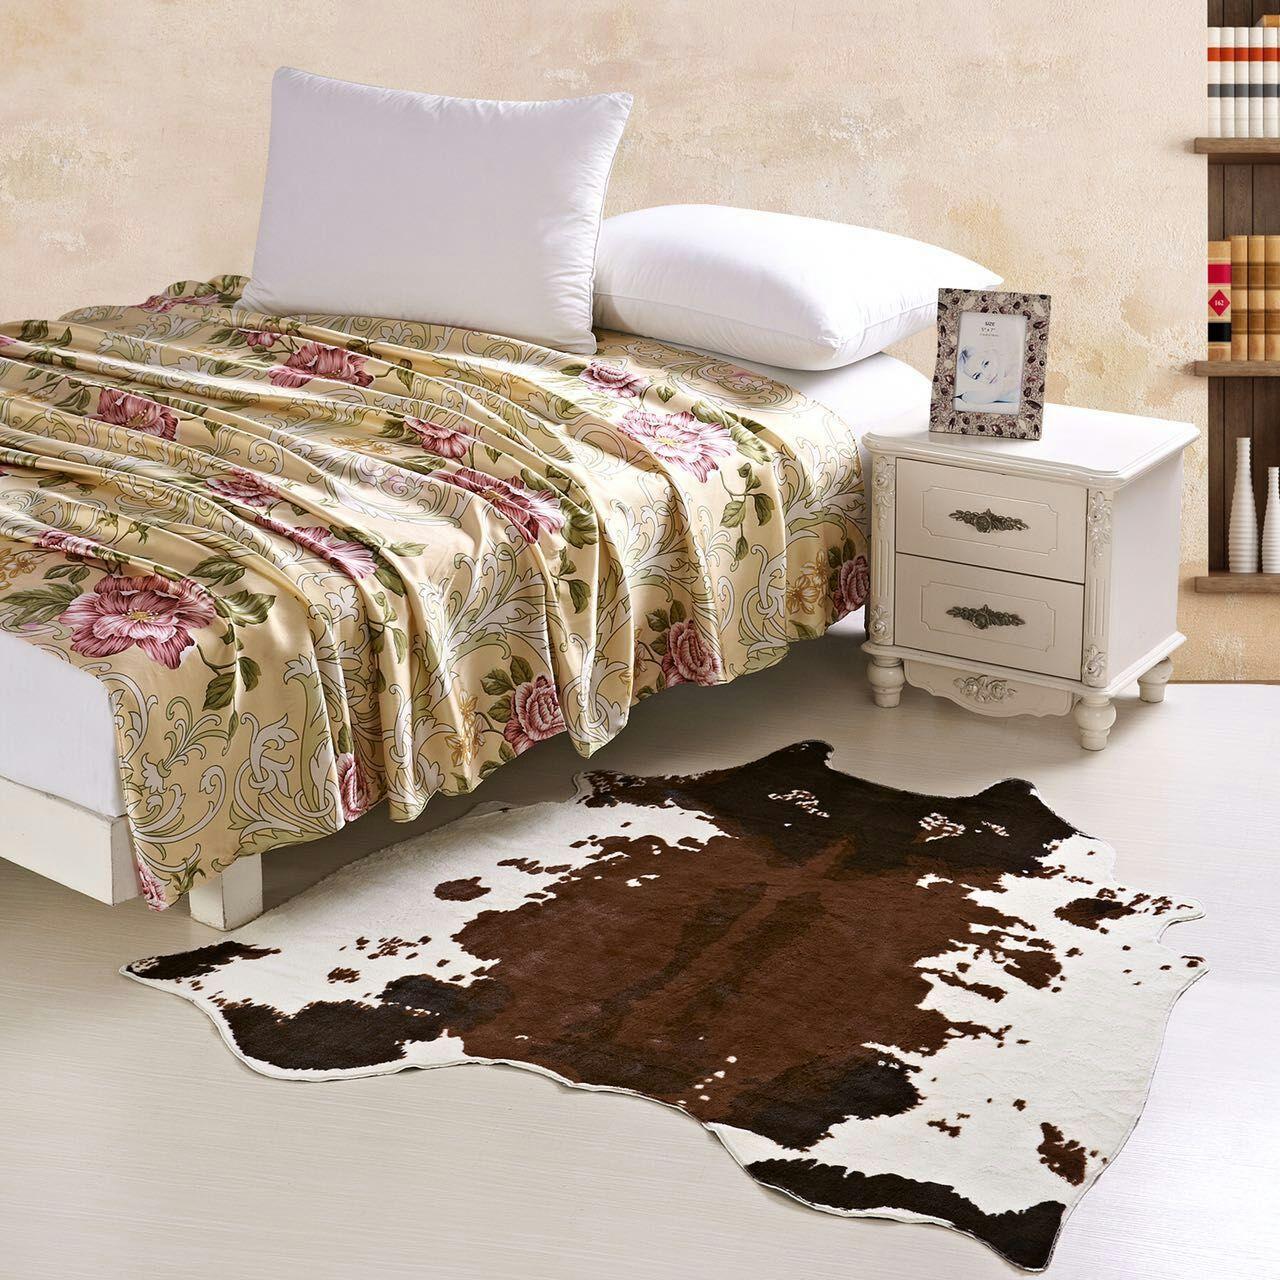 Cowboy Style Imitation Cow Zebra Skin Mats Creative Home Decoration Carpet Animal Prints Rugs Living